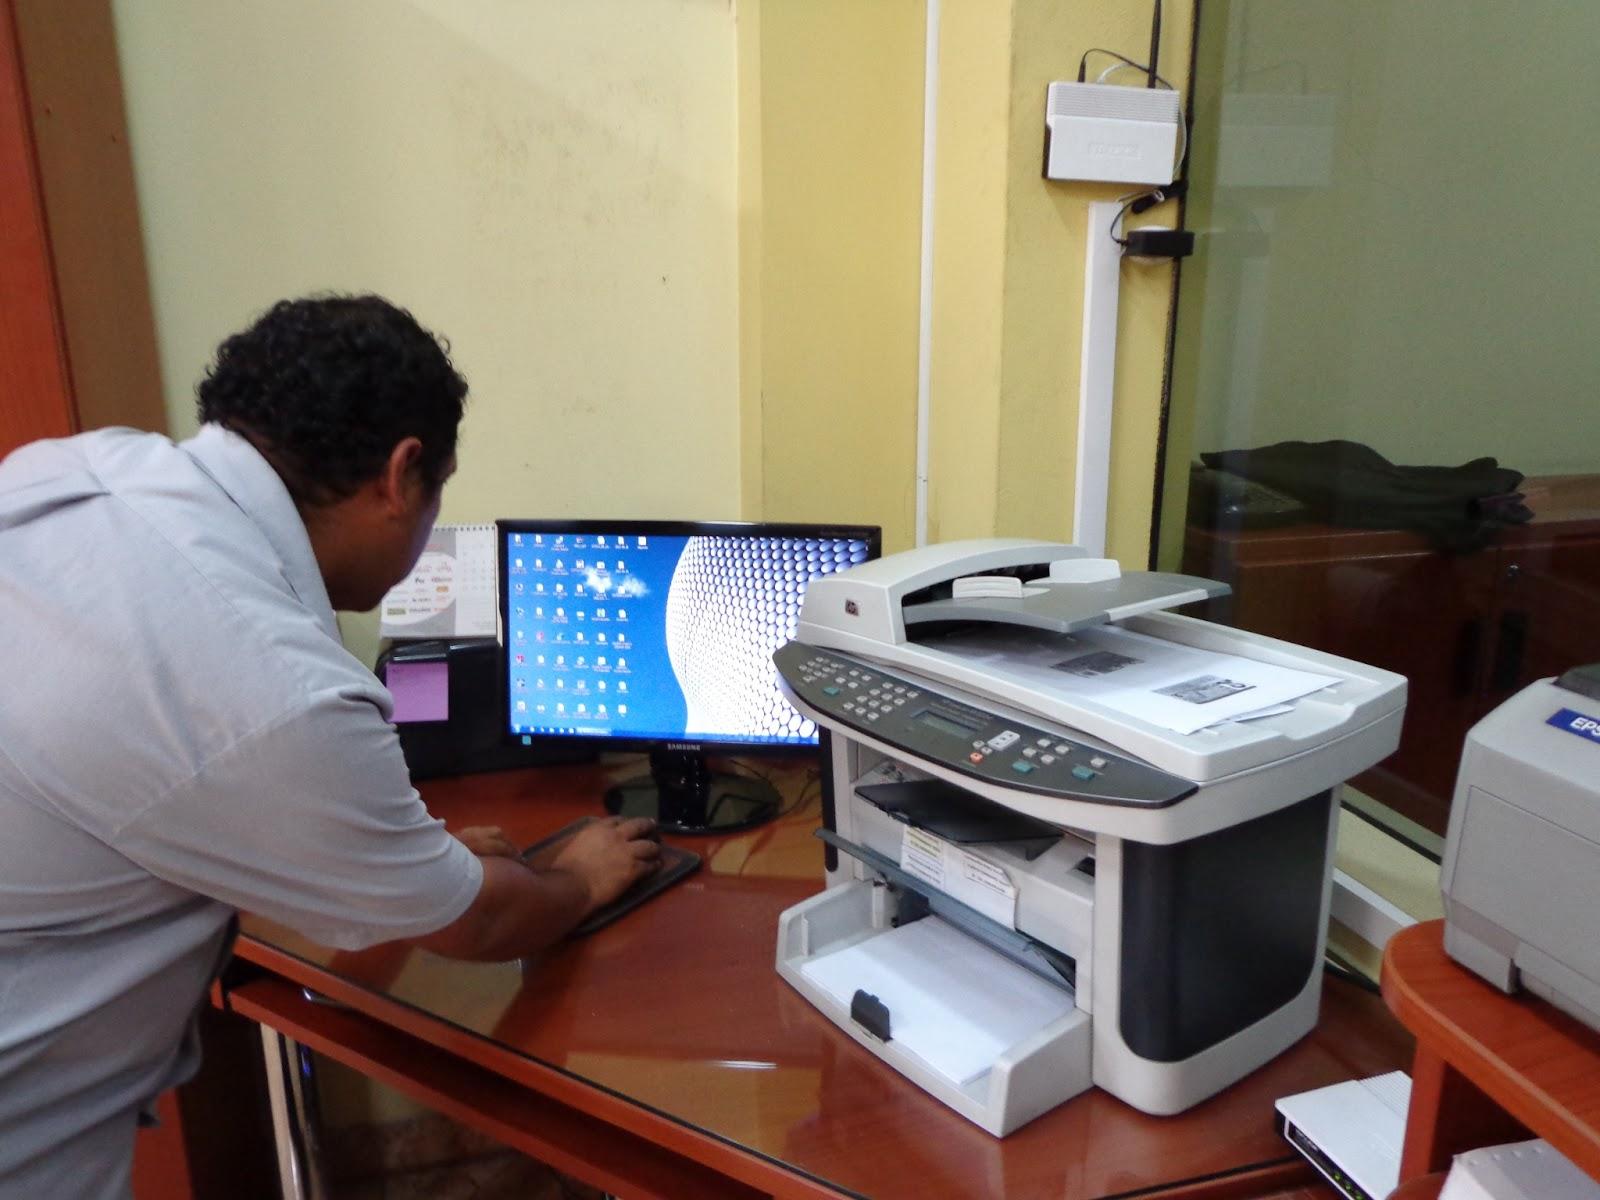 Redes inalambricas wifi lan wan independencia lima peru for Computadoras para oficina